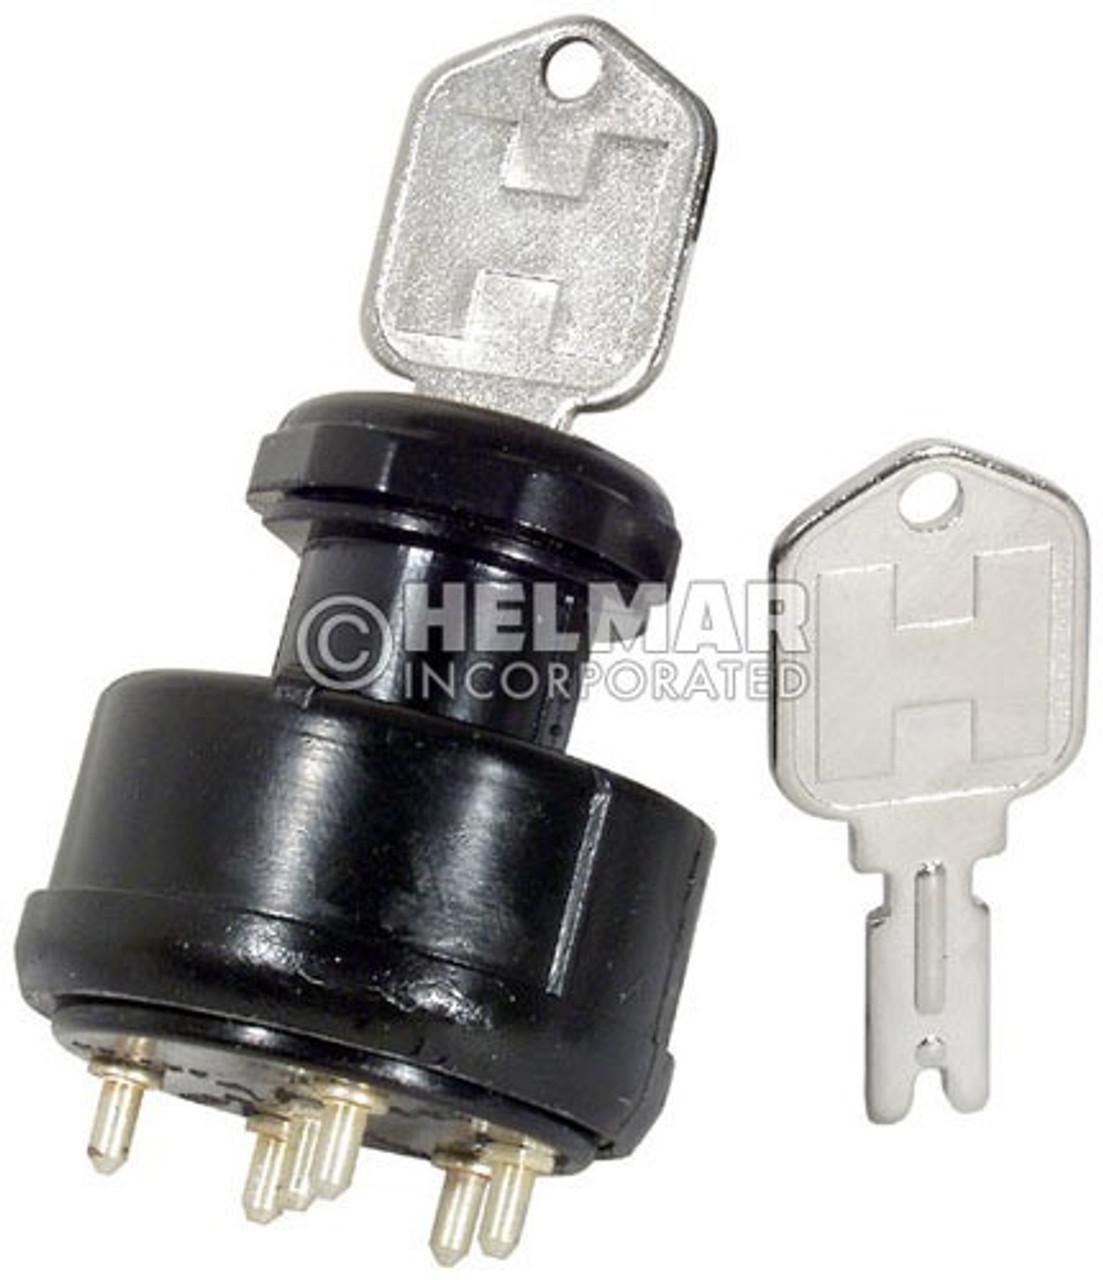 1337114 Hyster Anti-Restart Ignition Key Switch